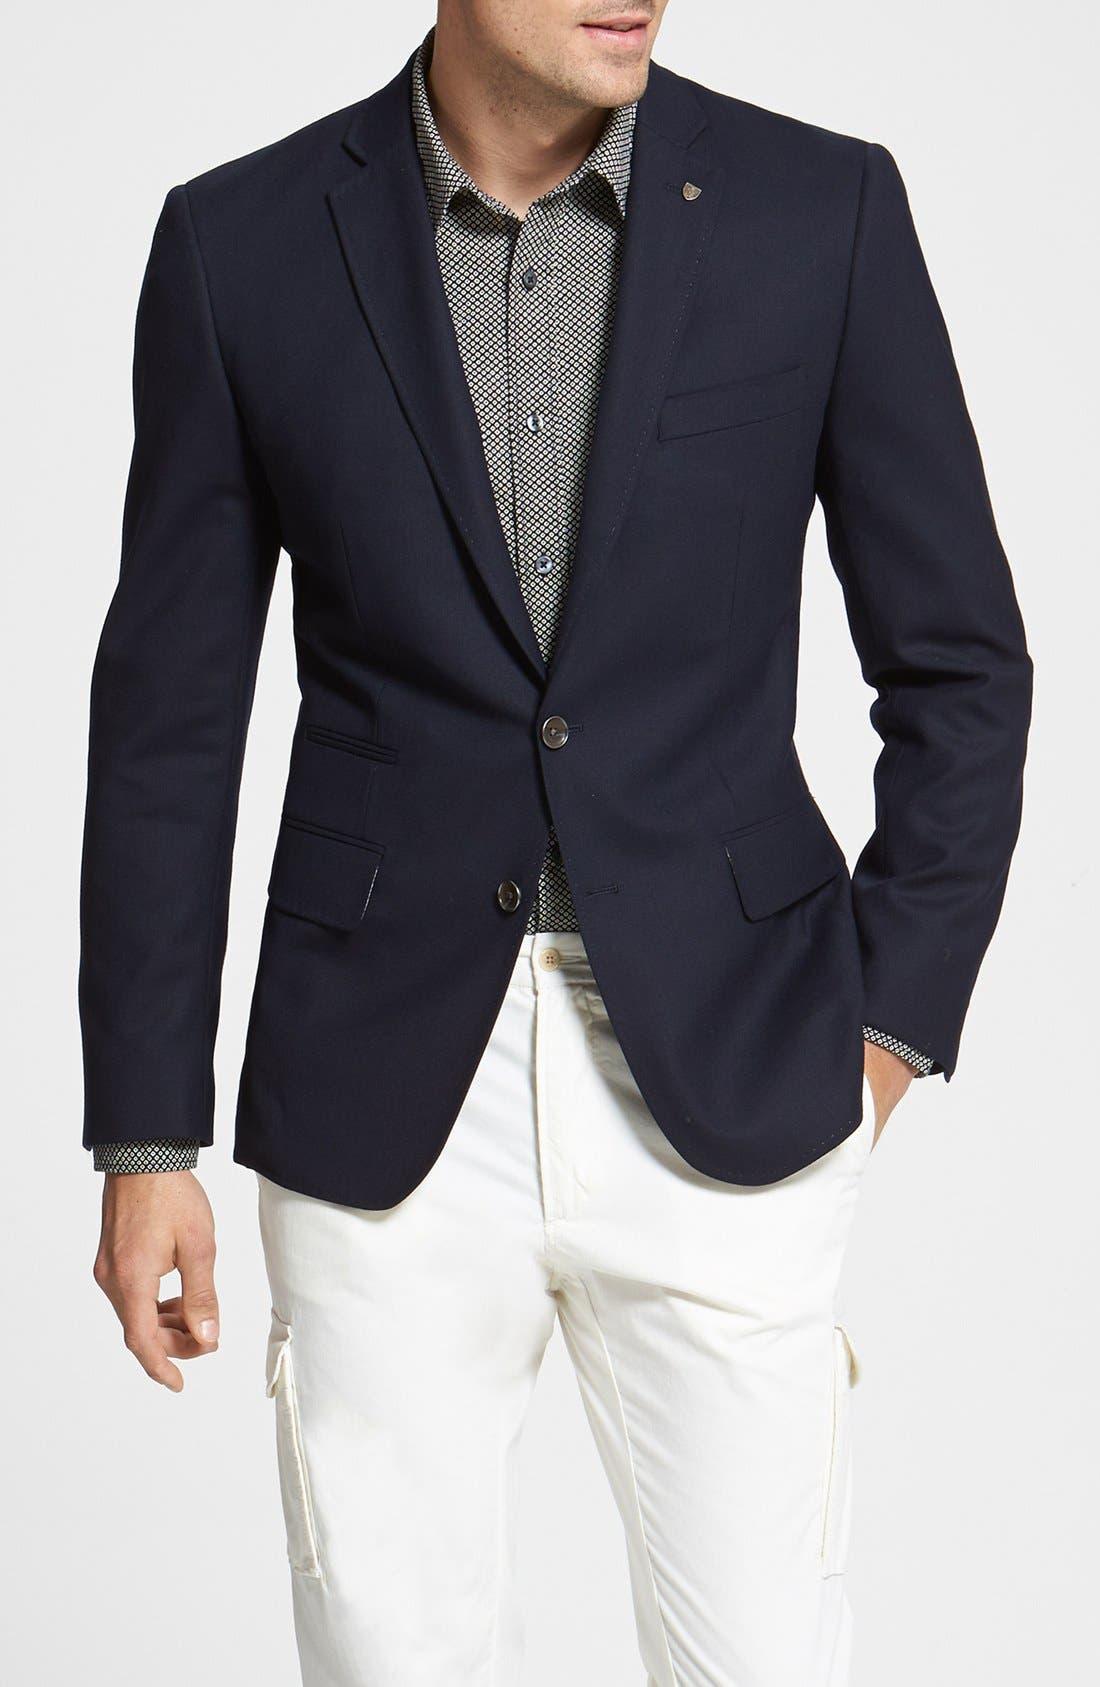 Main Image - Wallin & Bros. Trim Fit Wool Blazer